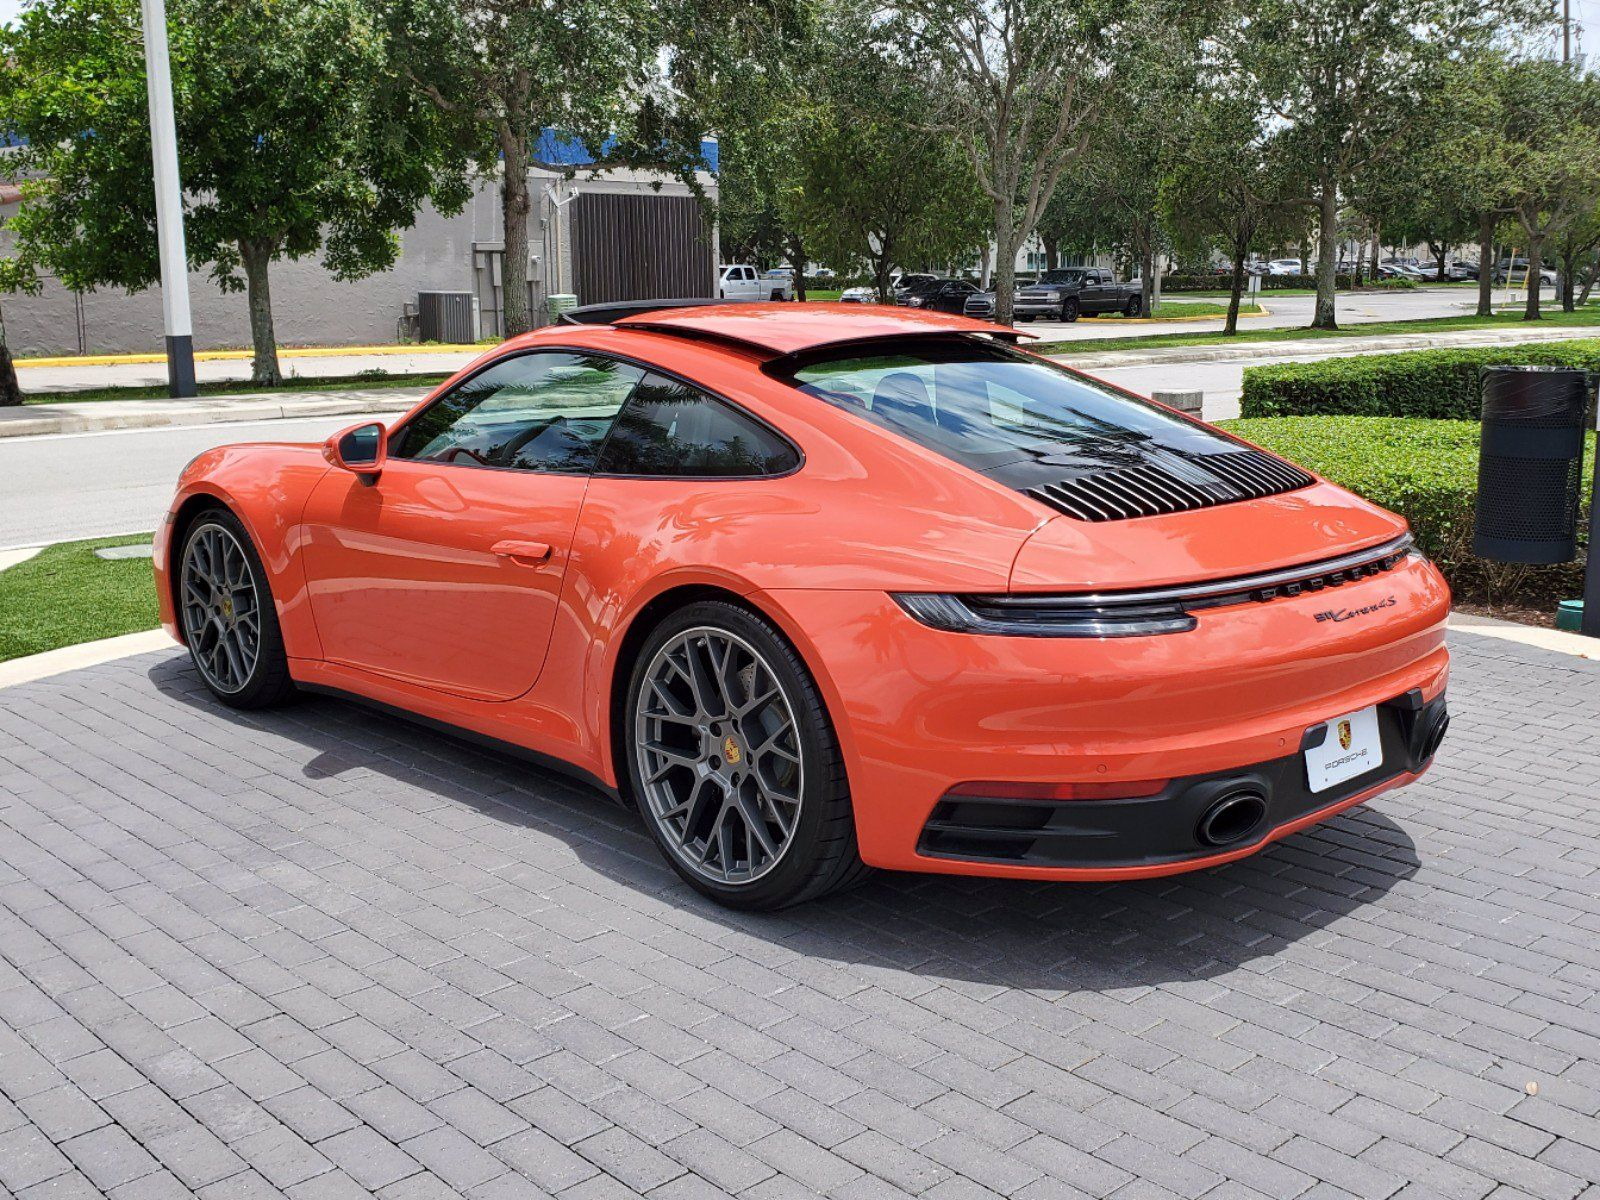 2020 Porsche 911 Carrera 4S (992) – 3